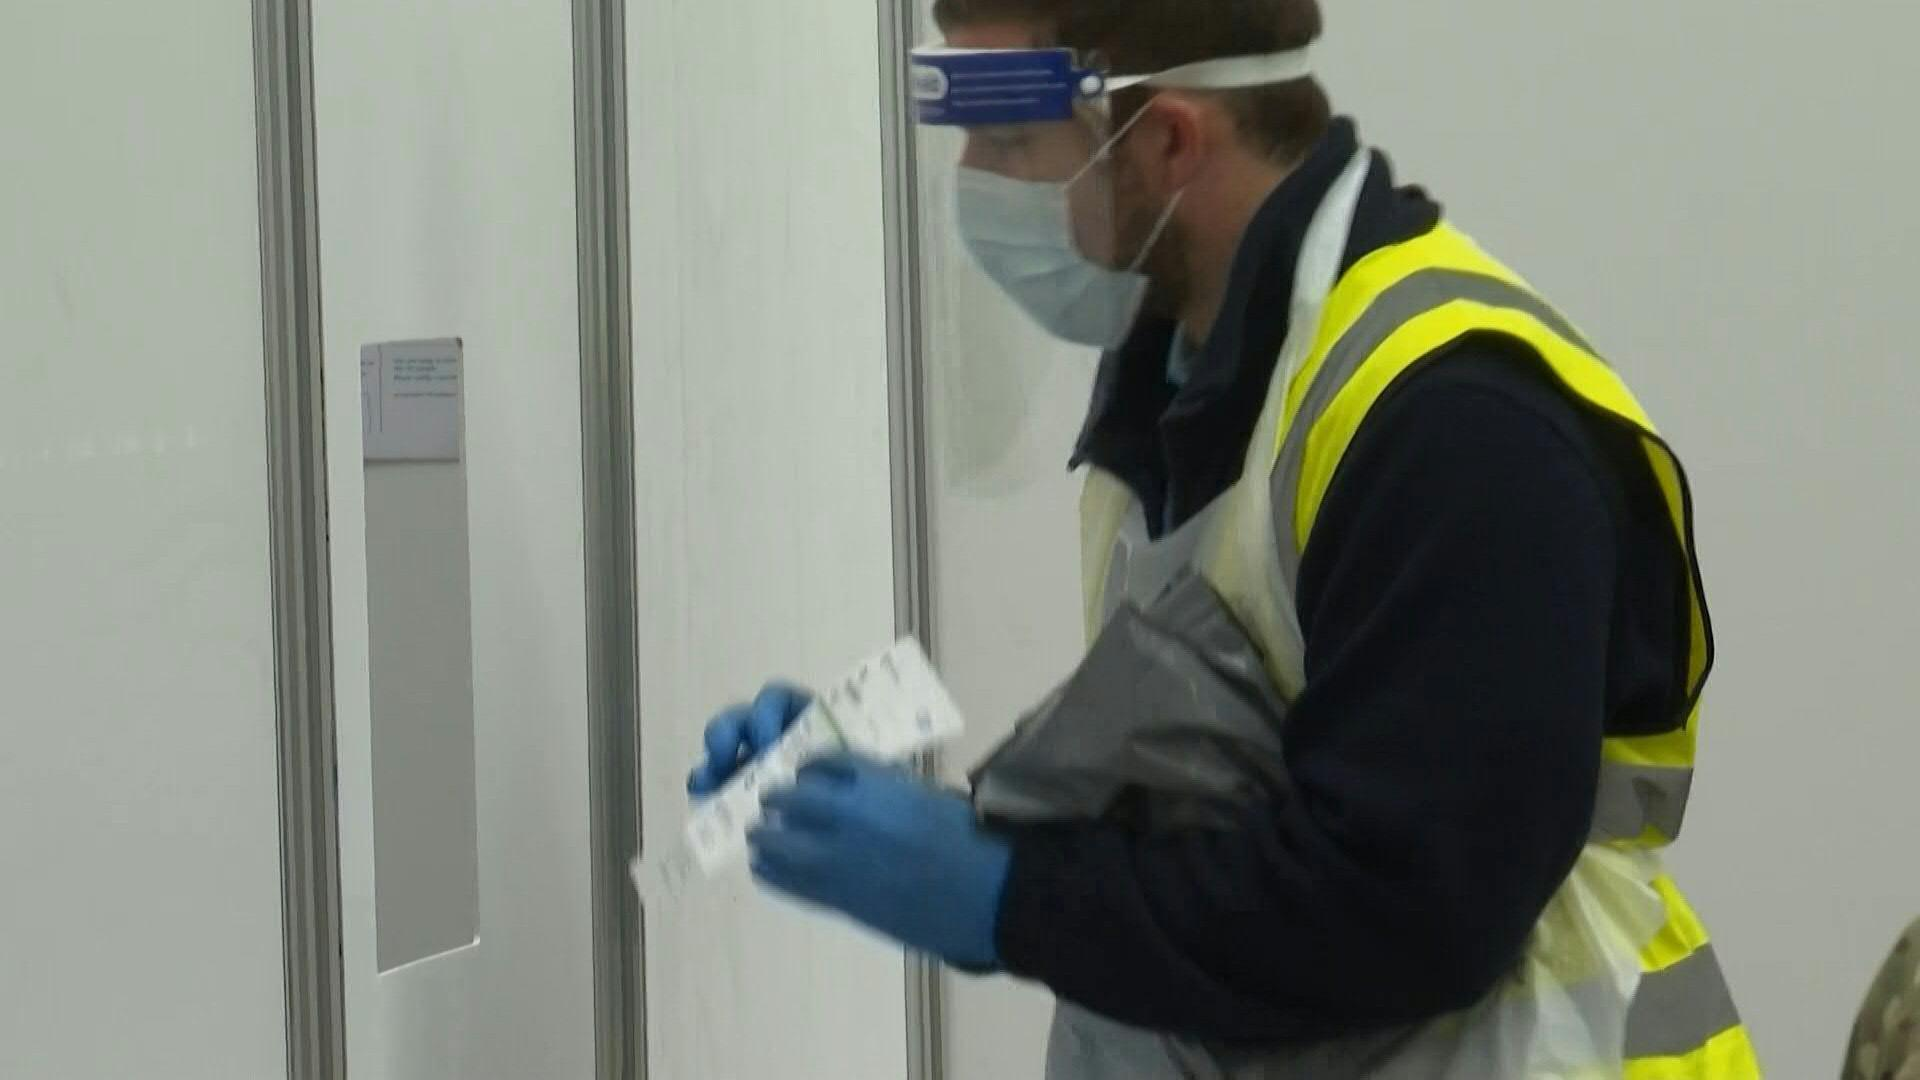 UK's first city-wide coronavirus testing kicks off in Liverpool